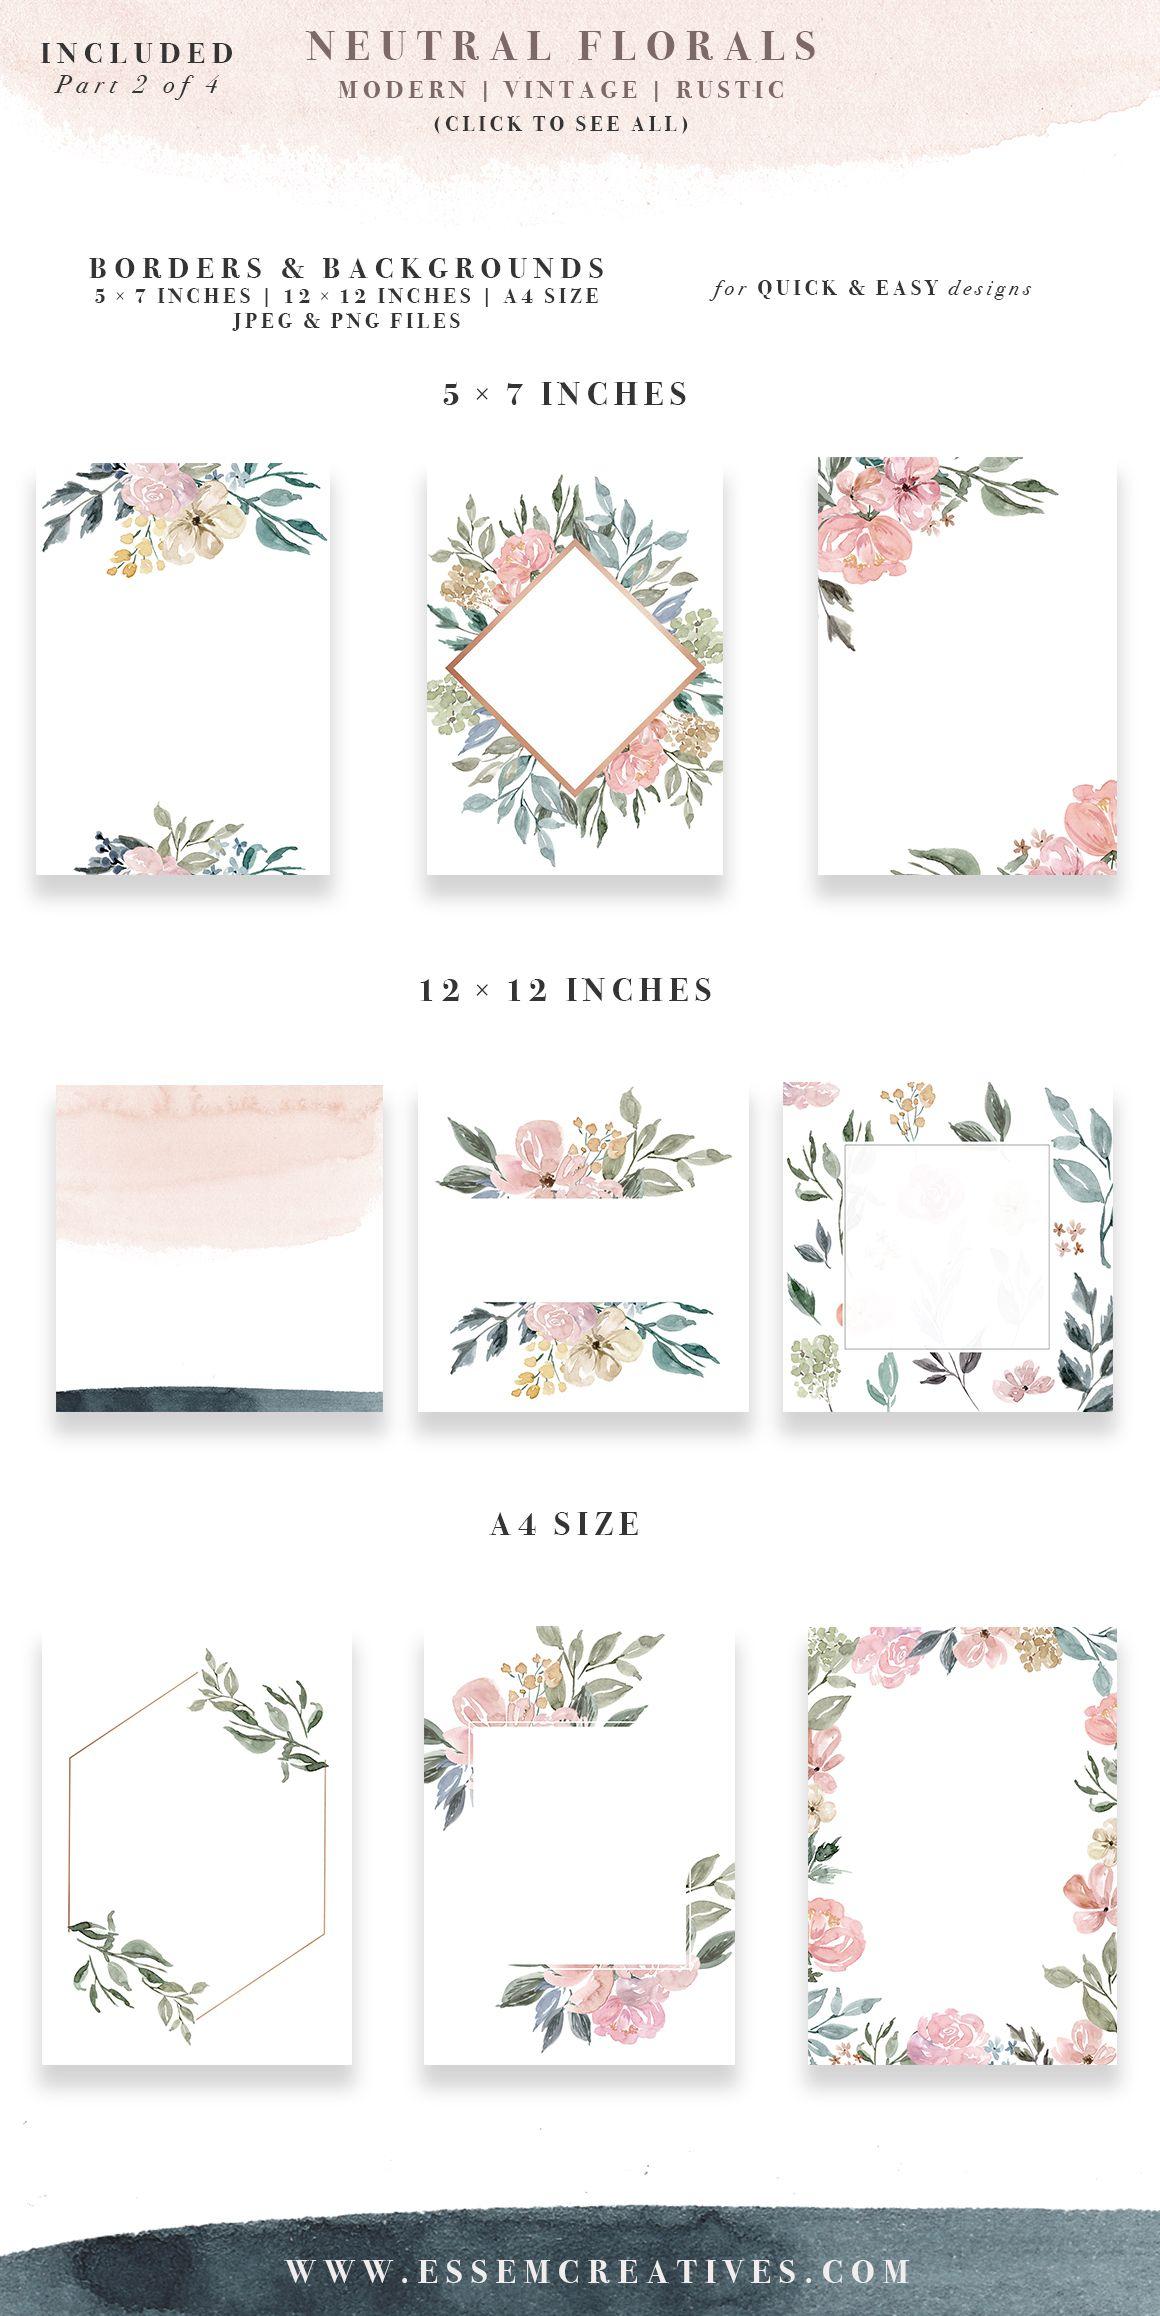 Neutral watercolor flowers clipart floral borders  frames background rustic vintage border clip art also for rh pinterest